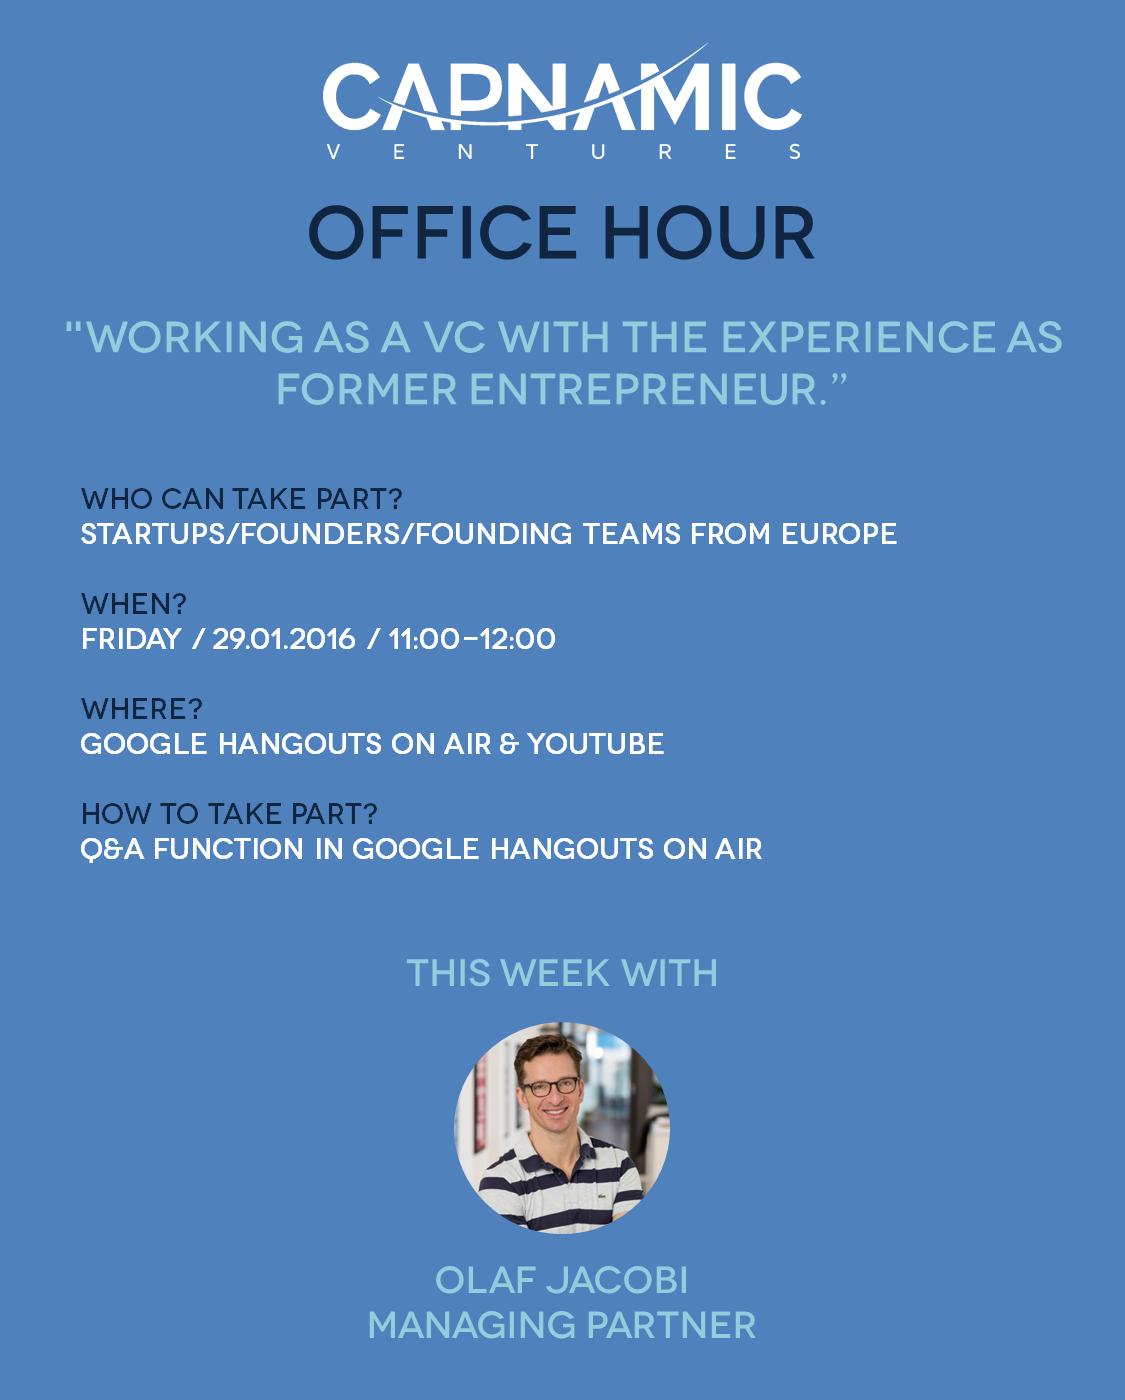 Capnamic_Office_Hour_7